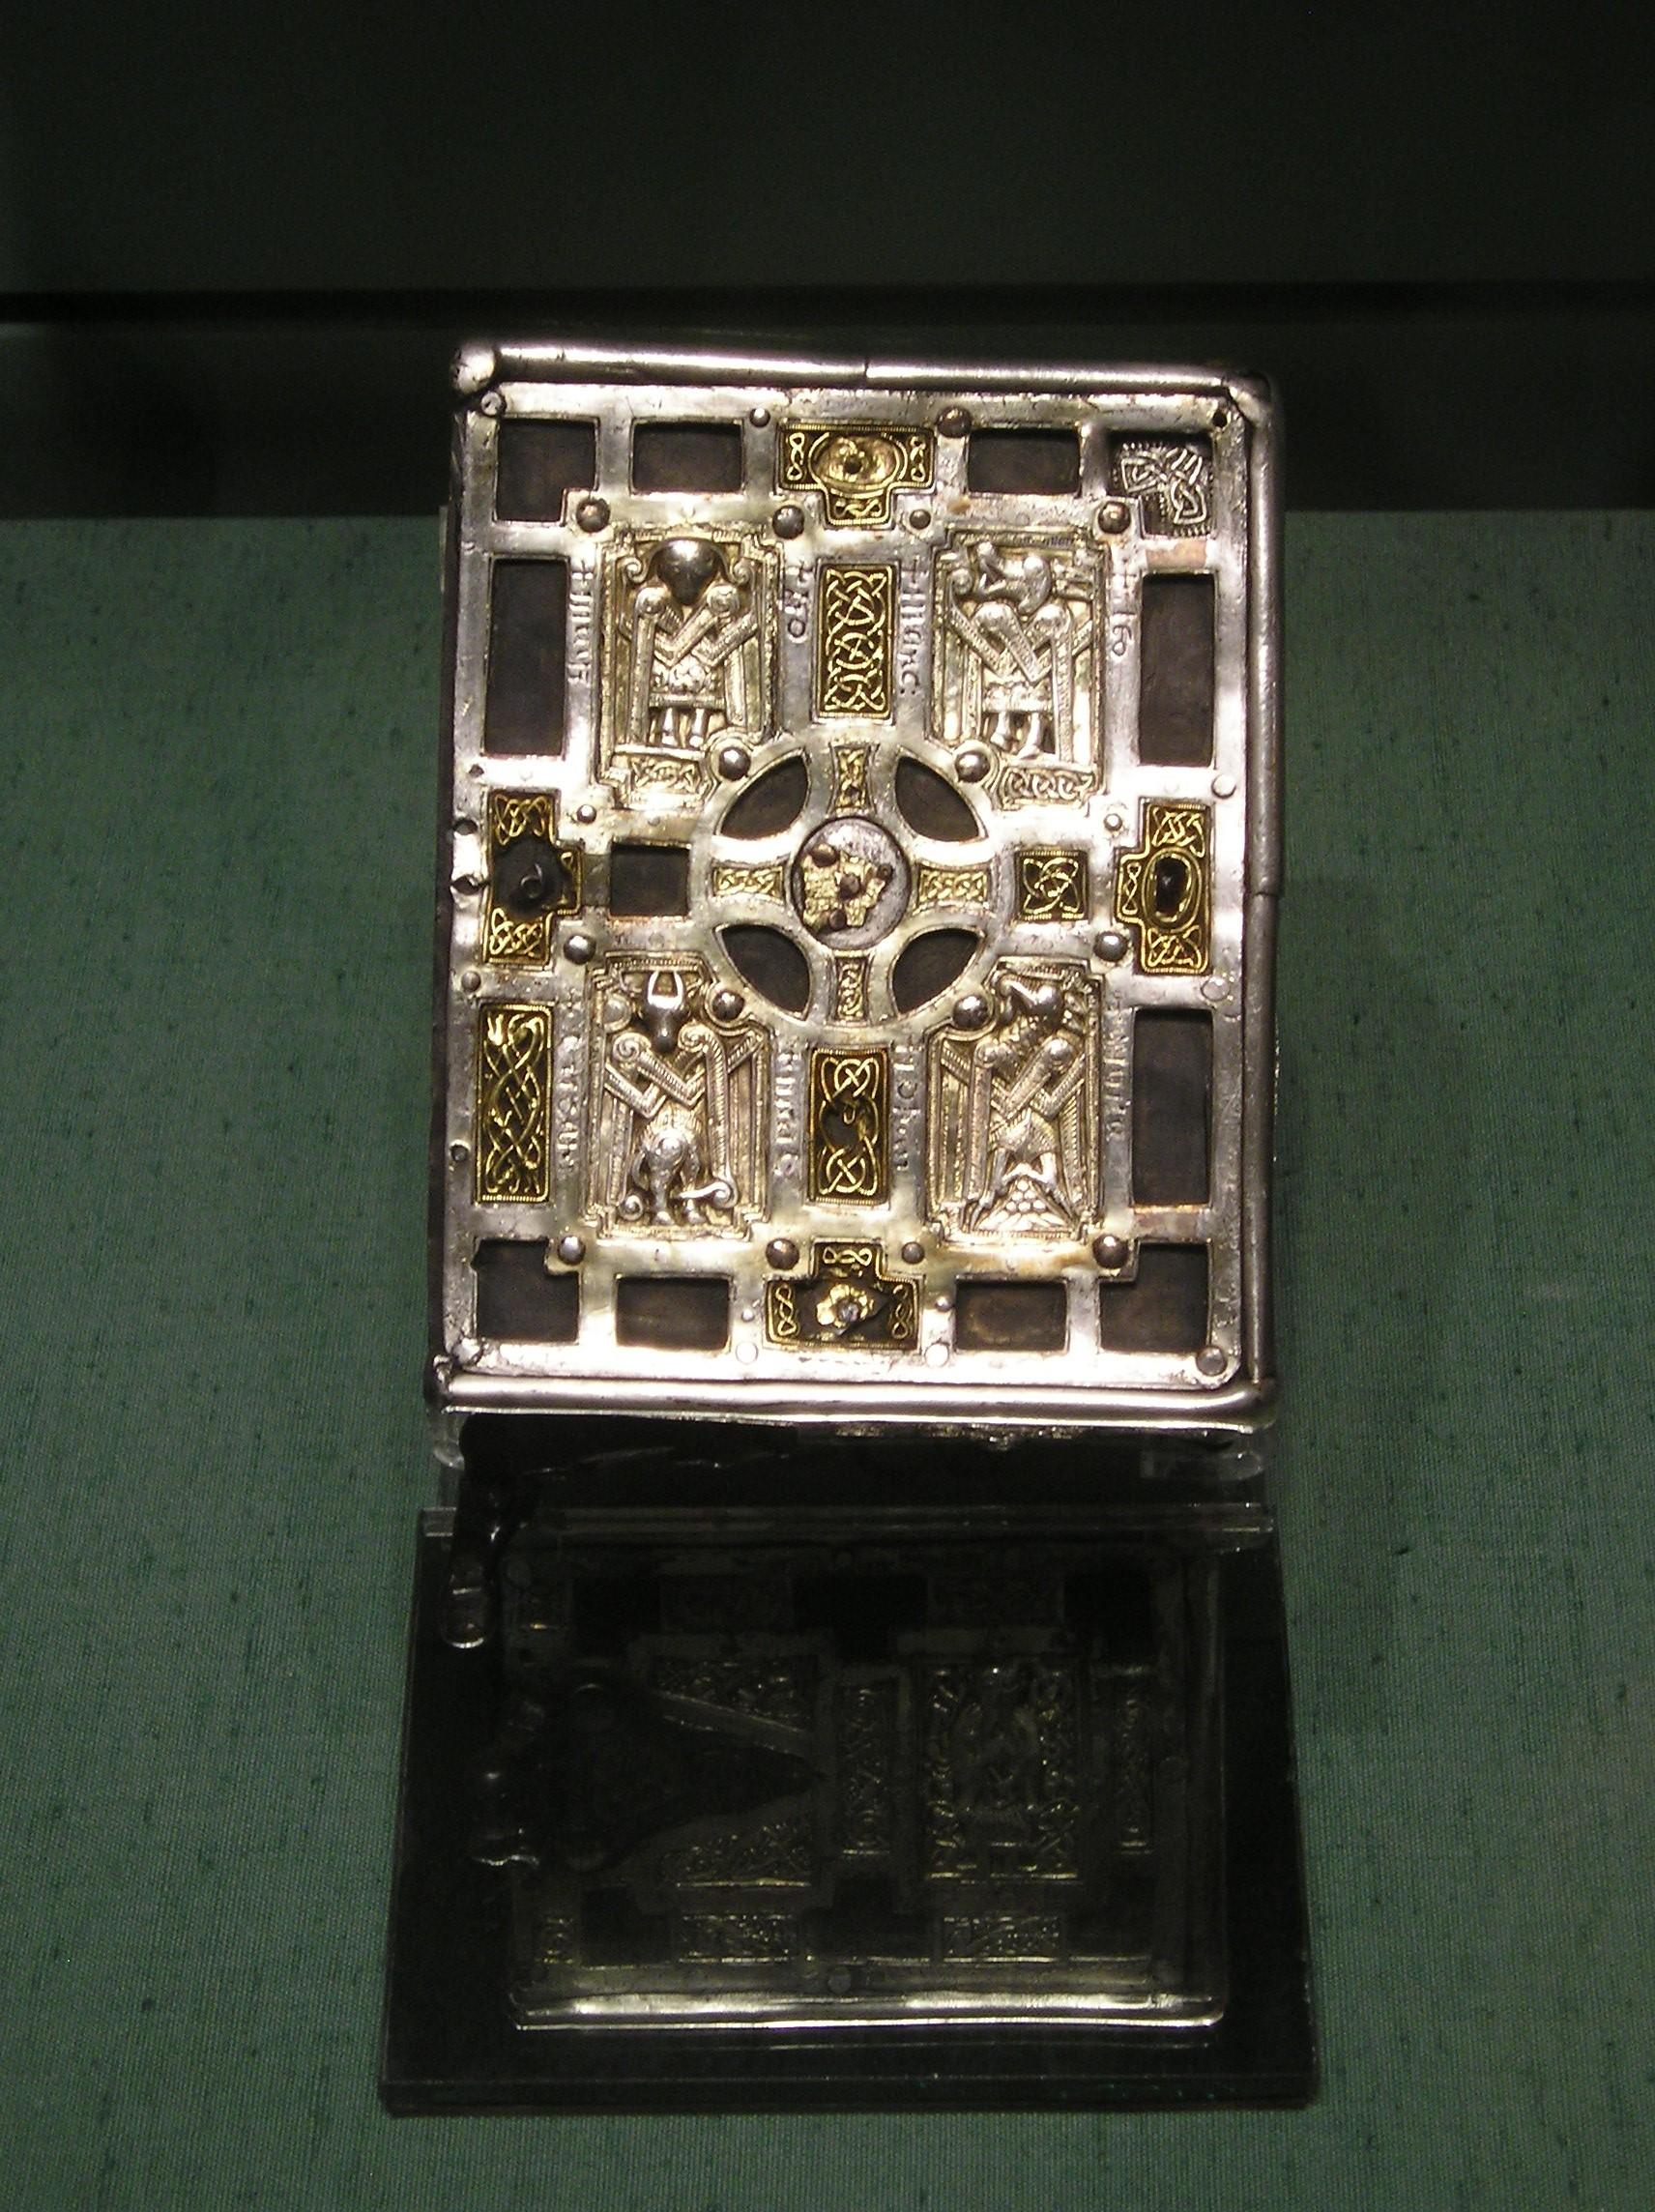 Shrine of the Soiscel Molaise